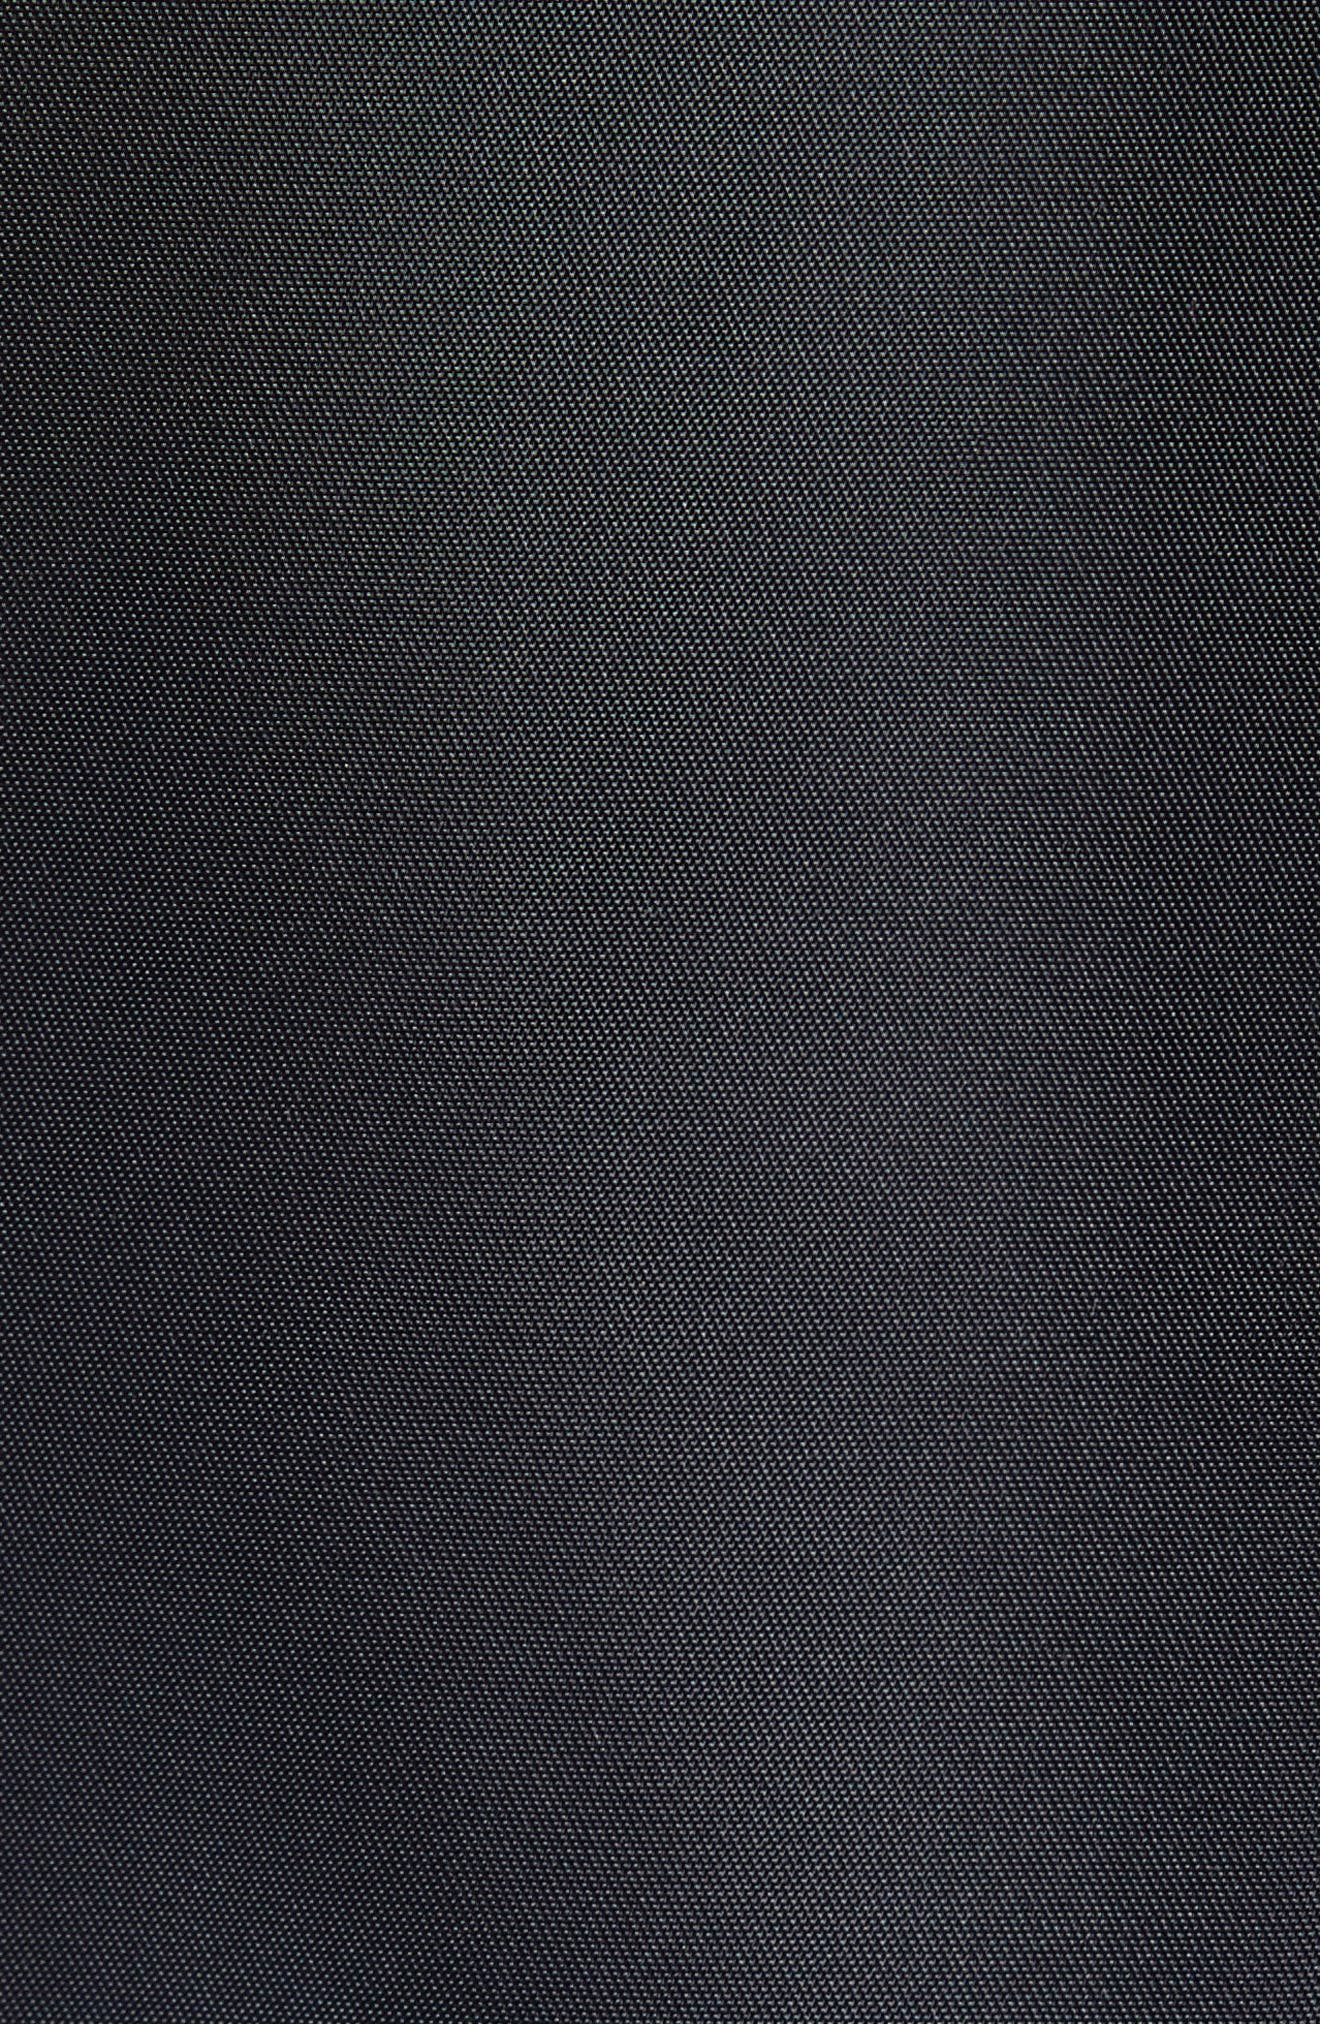 Mashup Nickelodeon Bomber Jacket,                             Alternate thumbnail 6, color,                             BLACK